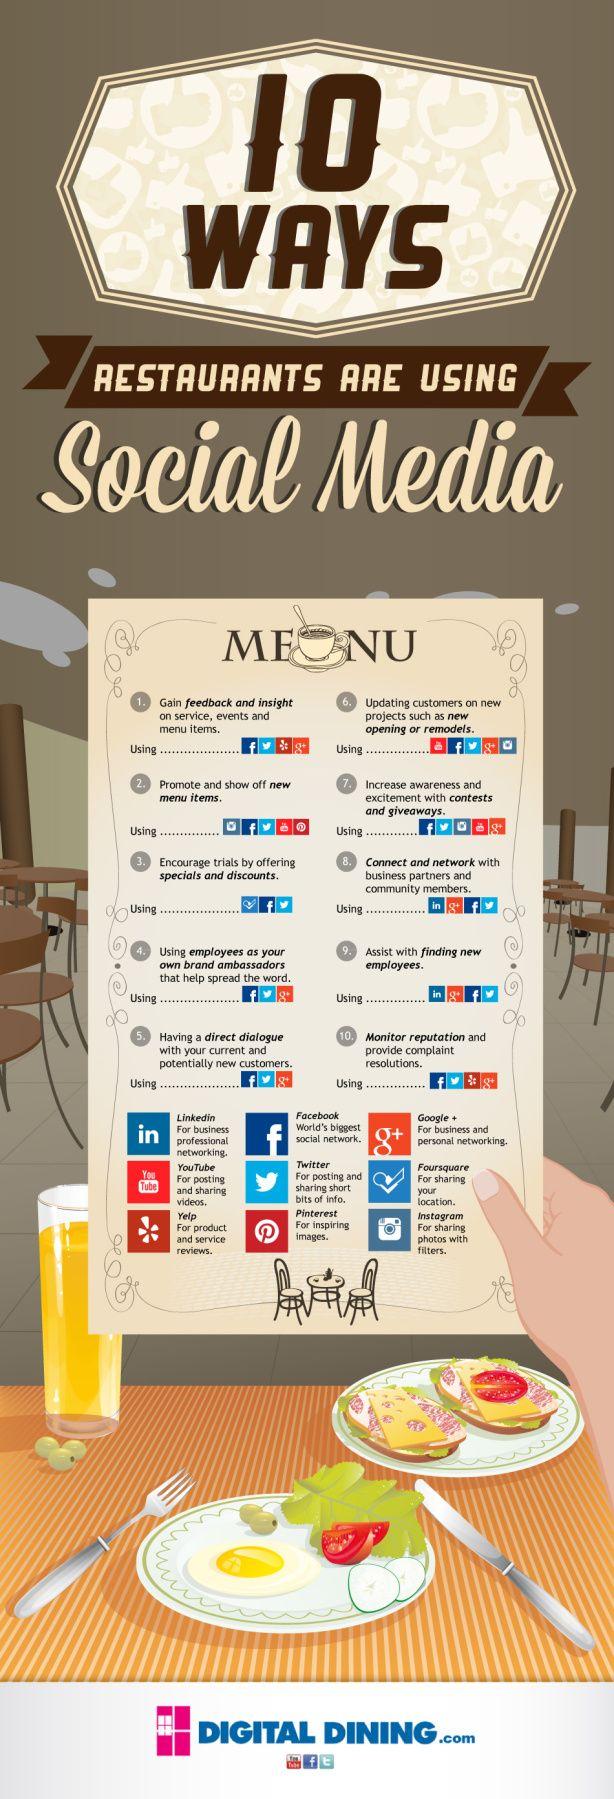 10 Ways Restaurants are Using #Social Media - Make social media work for your #business